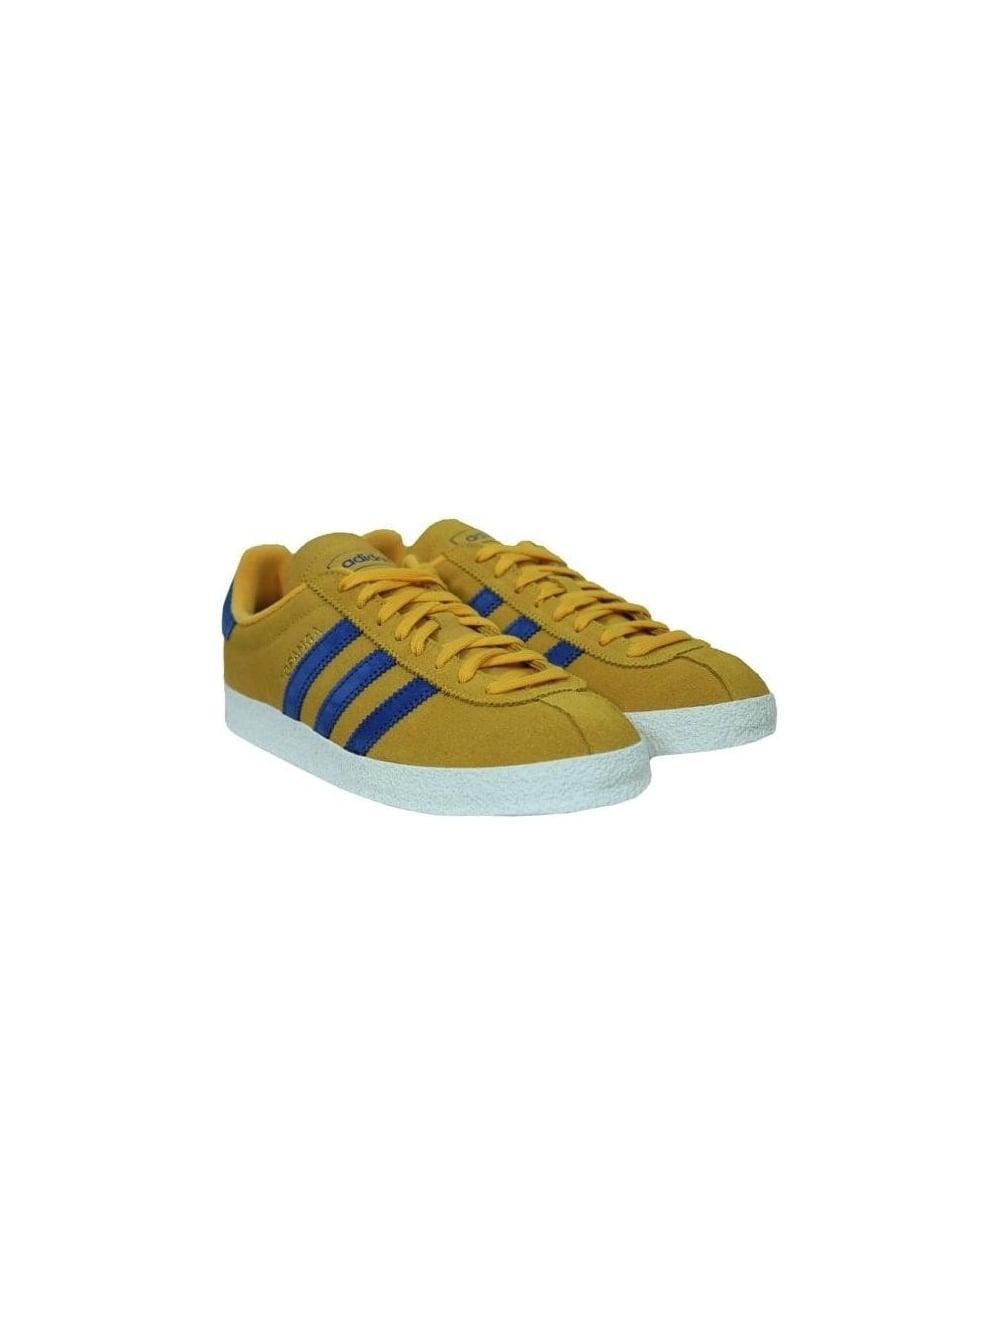 separation shoes db3c4 010cc Topanga - Gold Marine